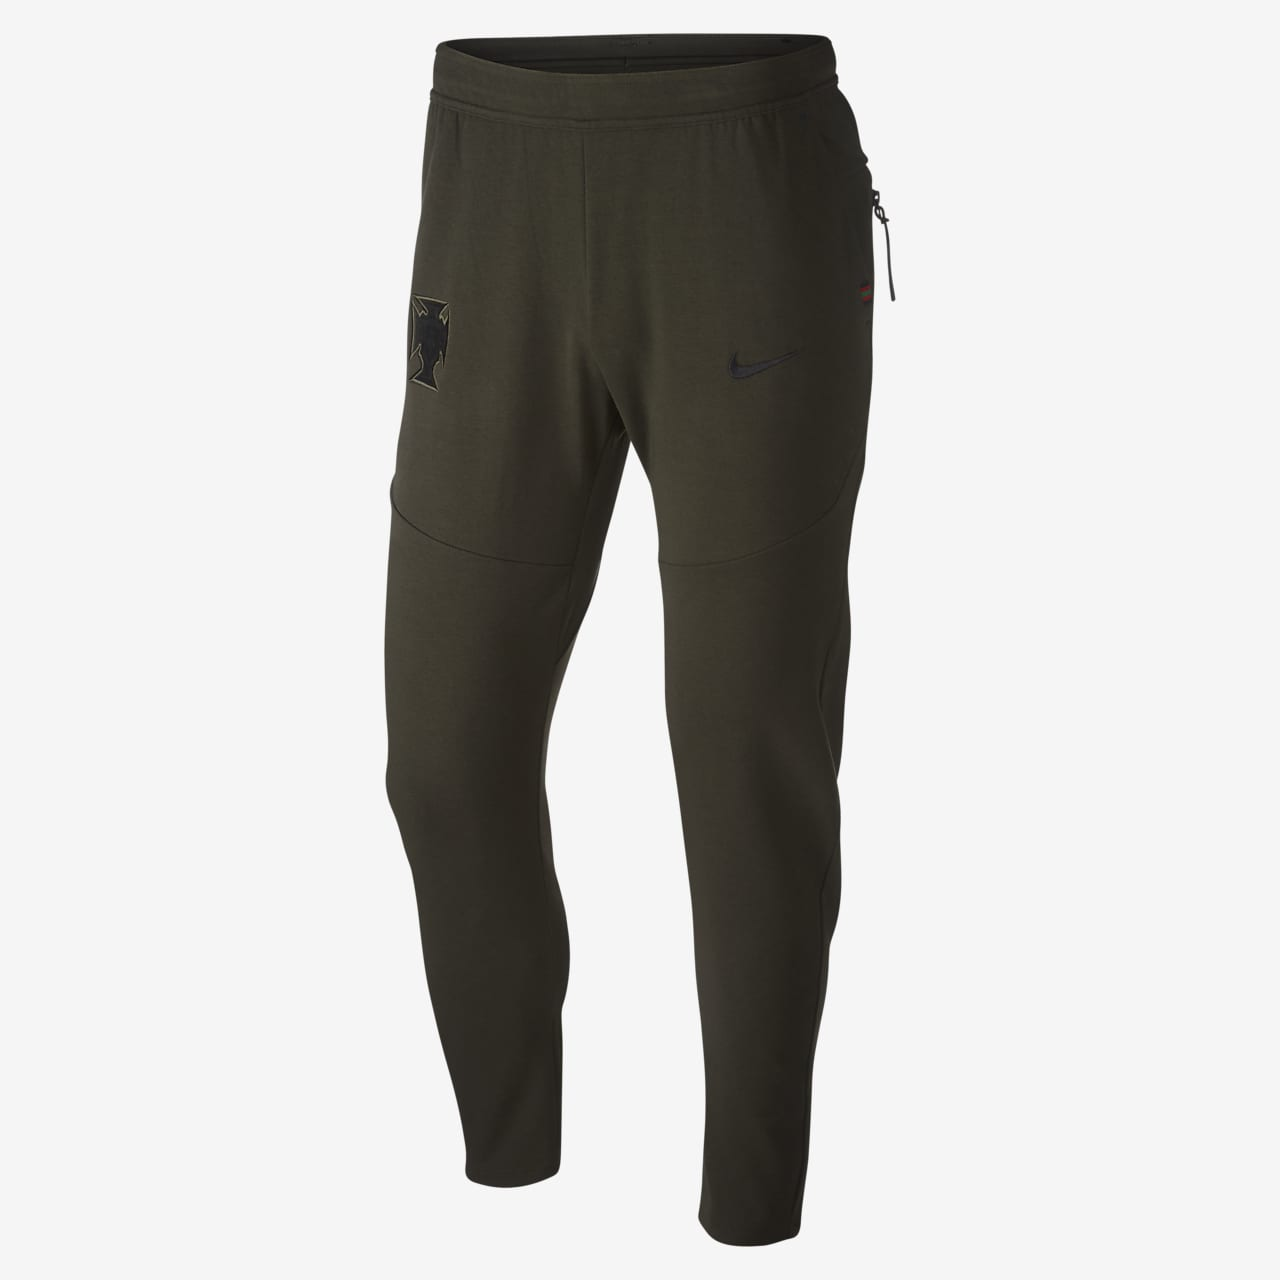 Pantaloni Portogallo Tech Pack - Uomo